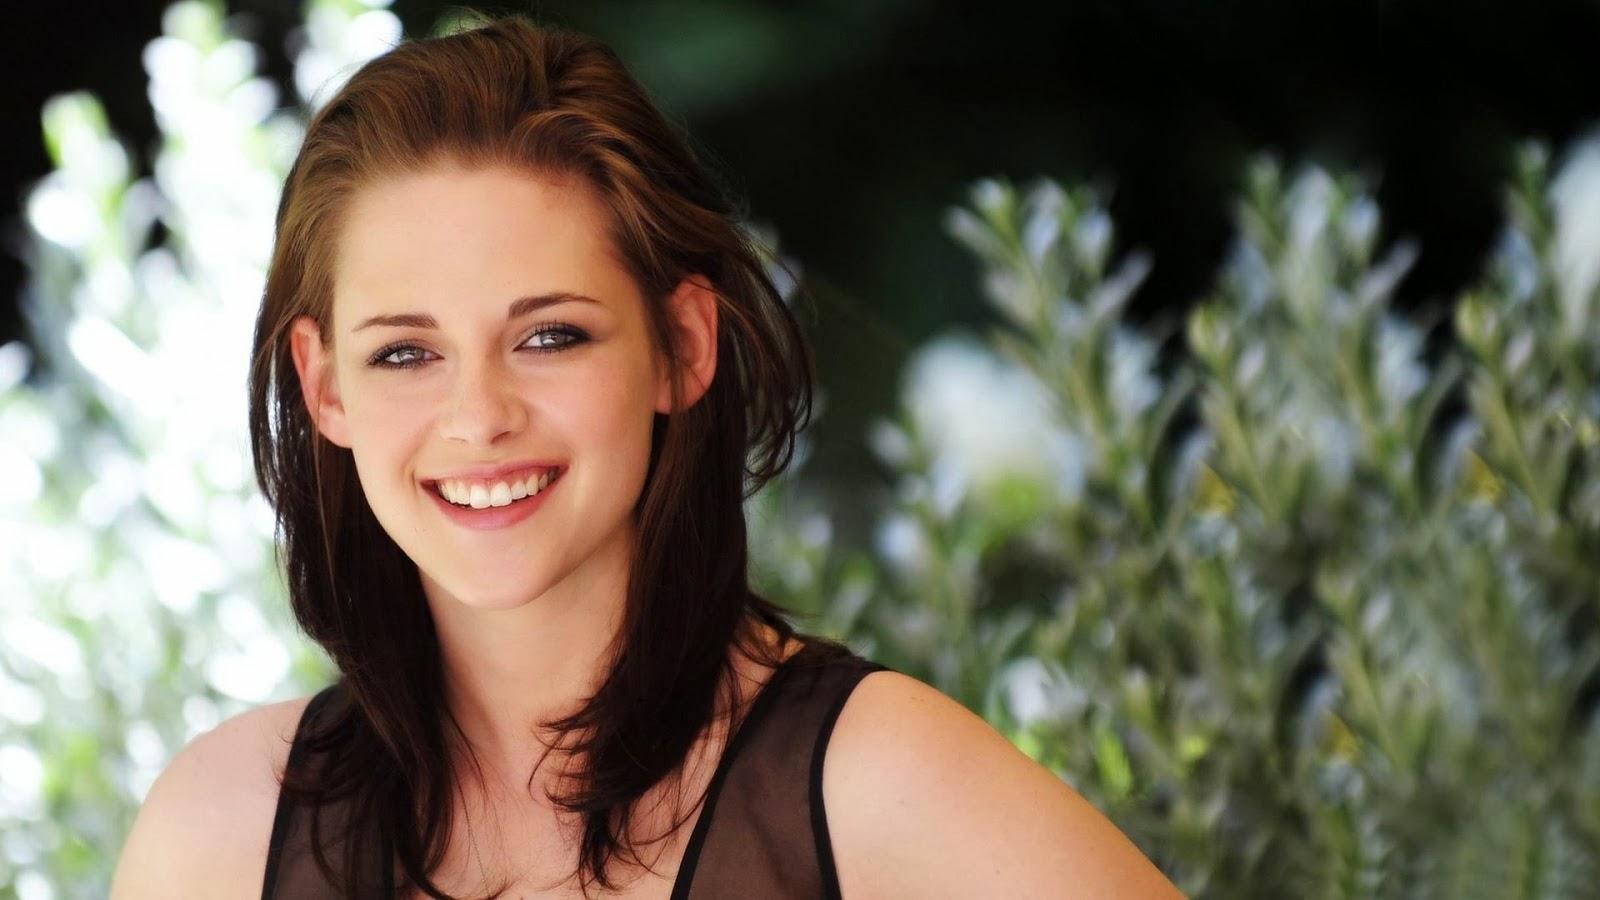 Hollywood Actress Hd Wallpaper: Actresses HD Wallpapers: Hollywood Actress